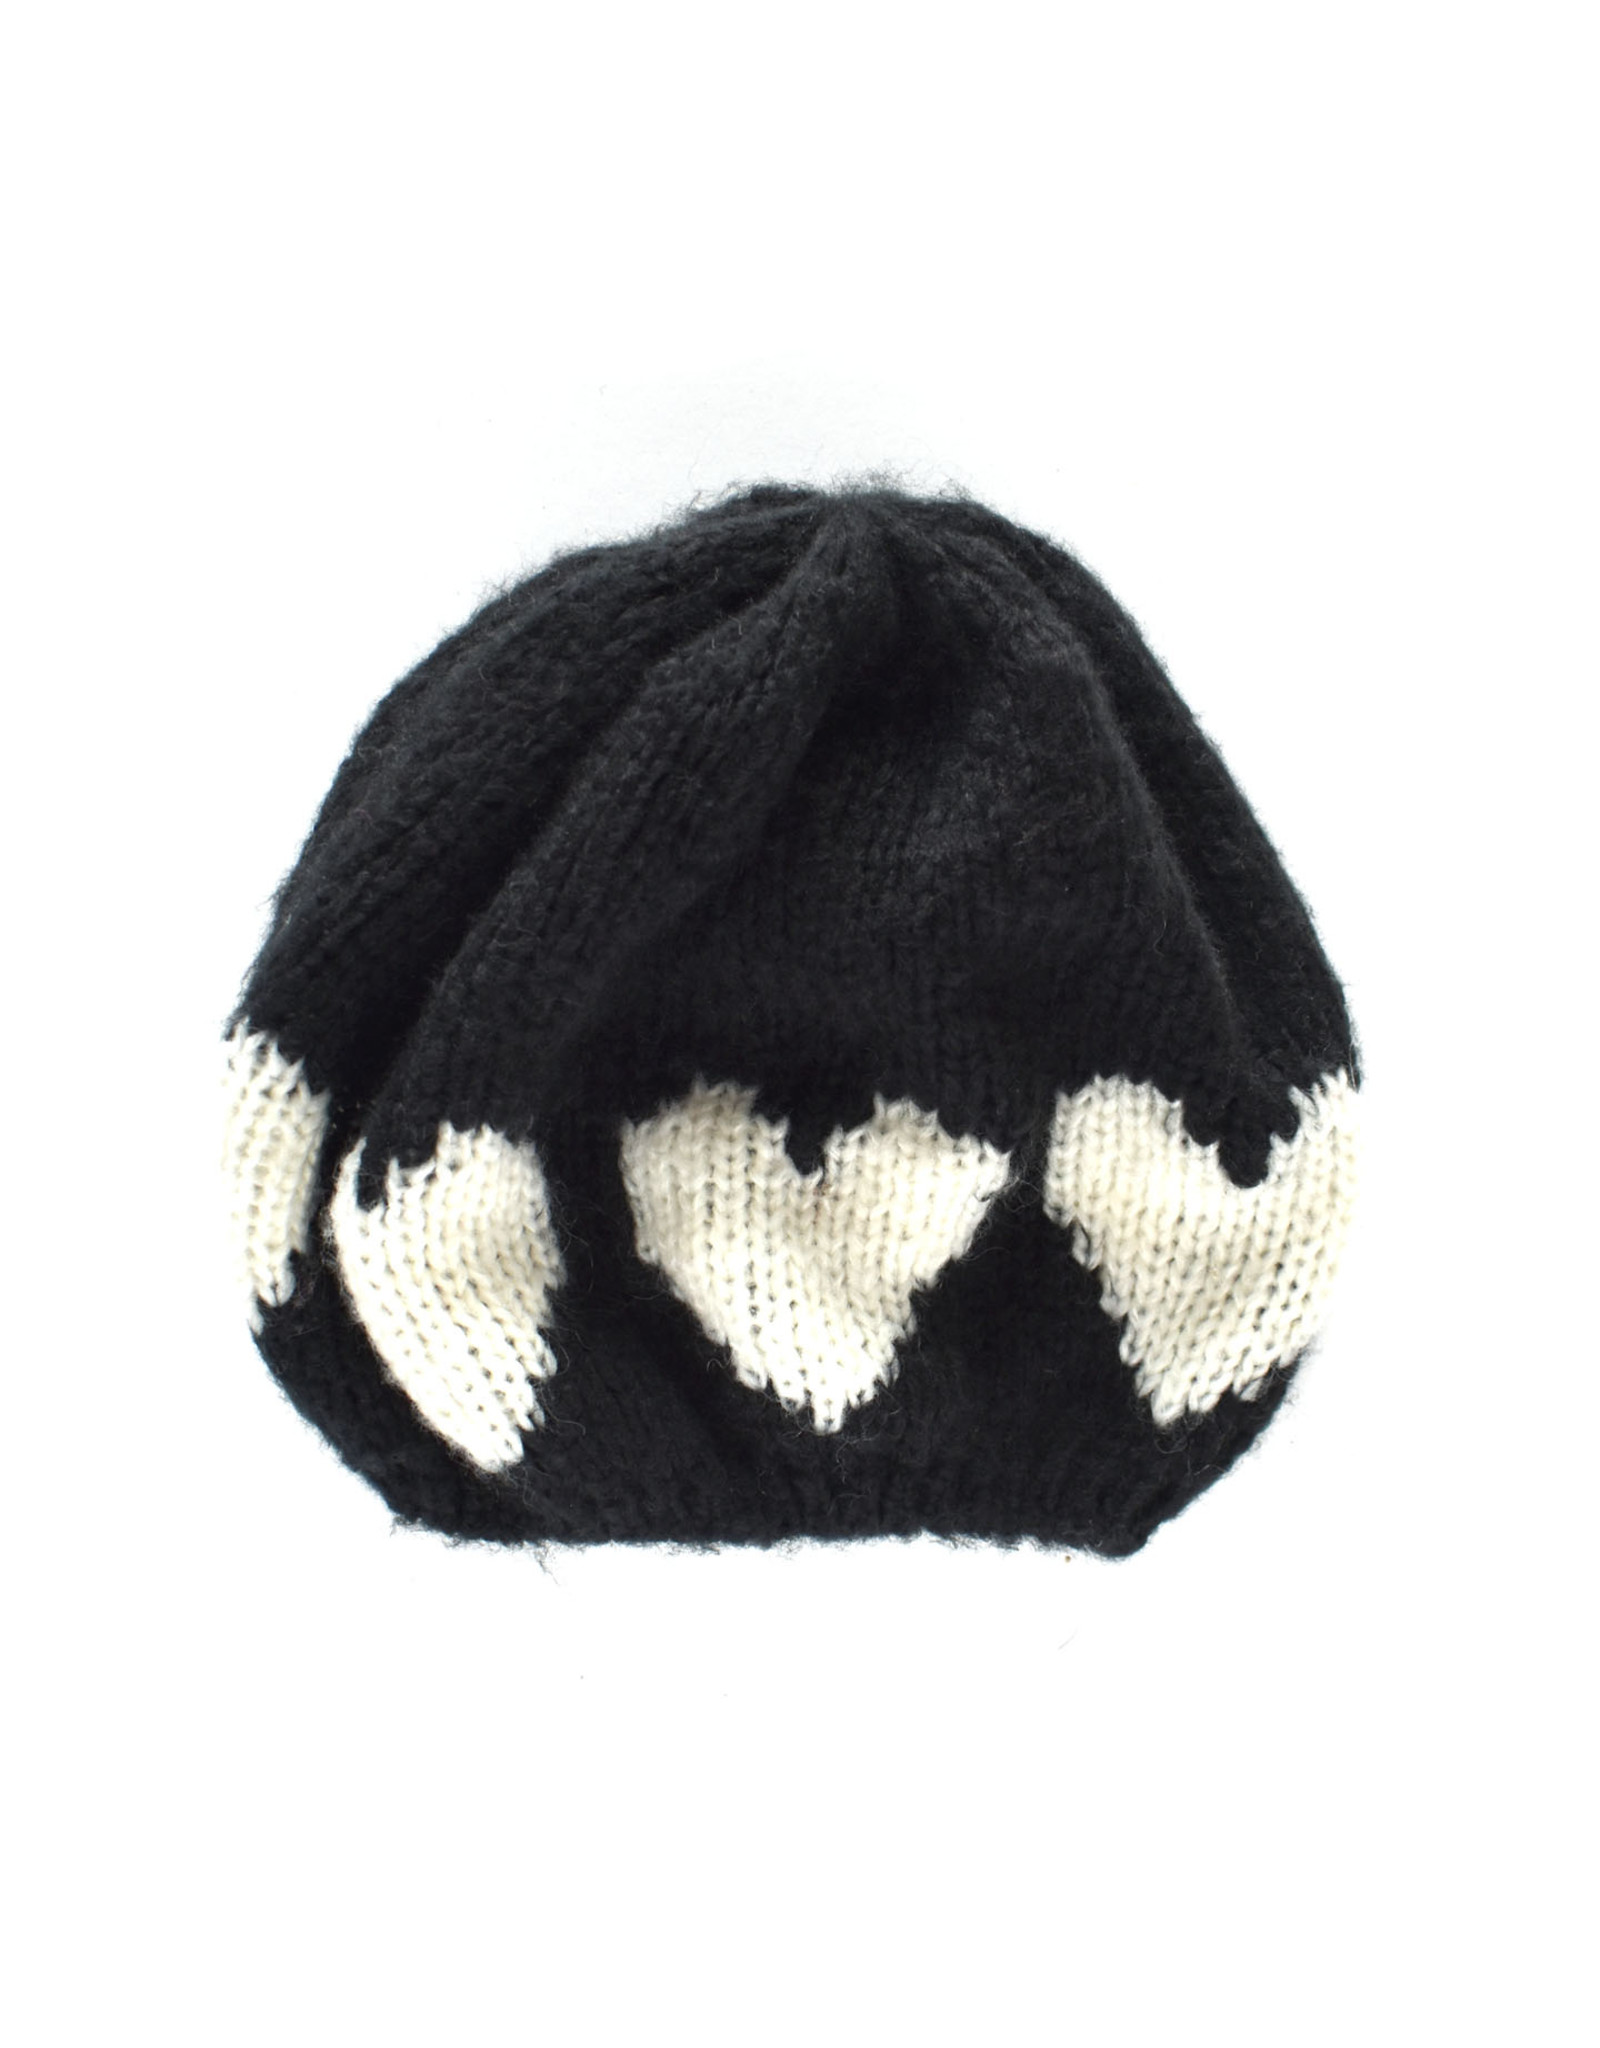 Heart Beanie : Black & Bone